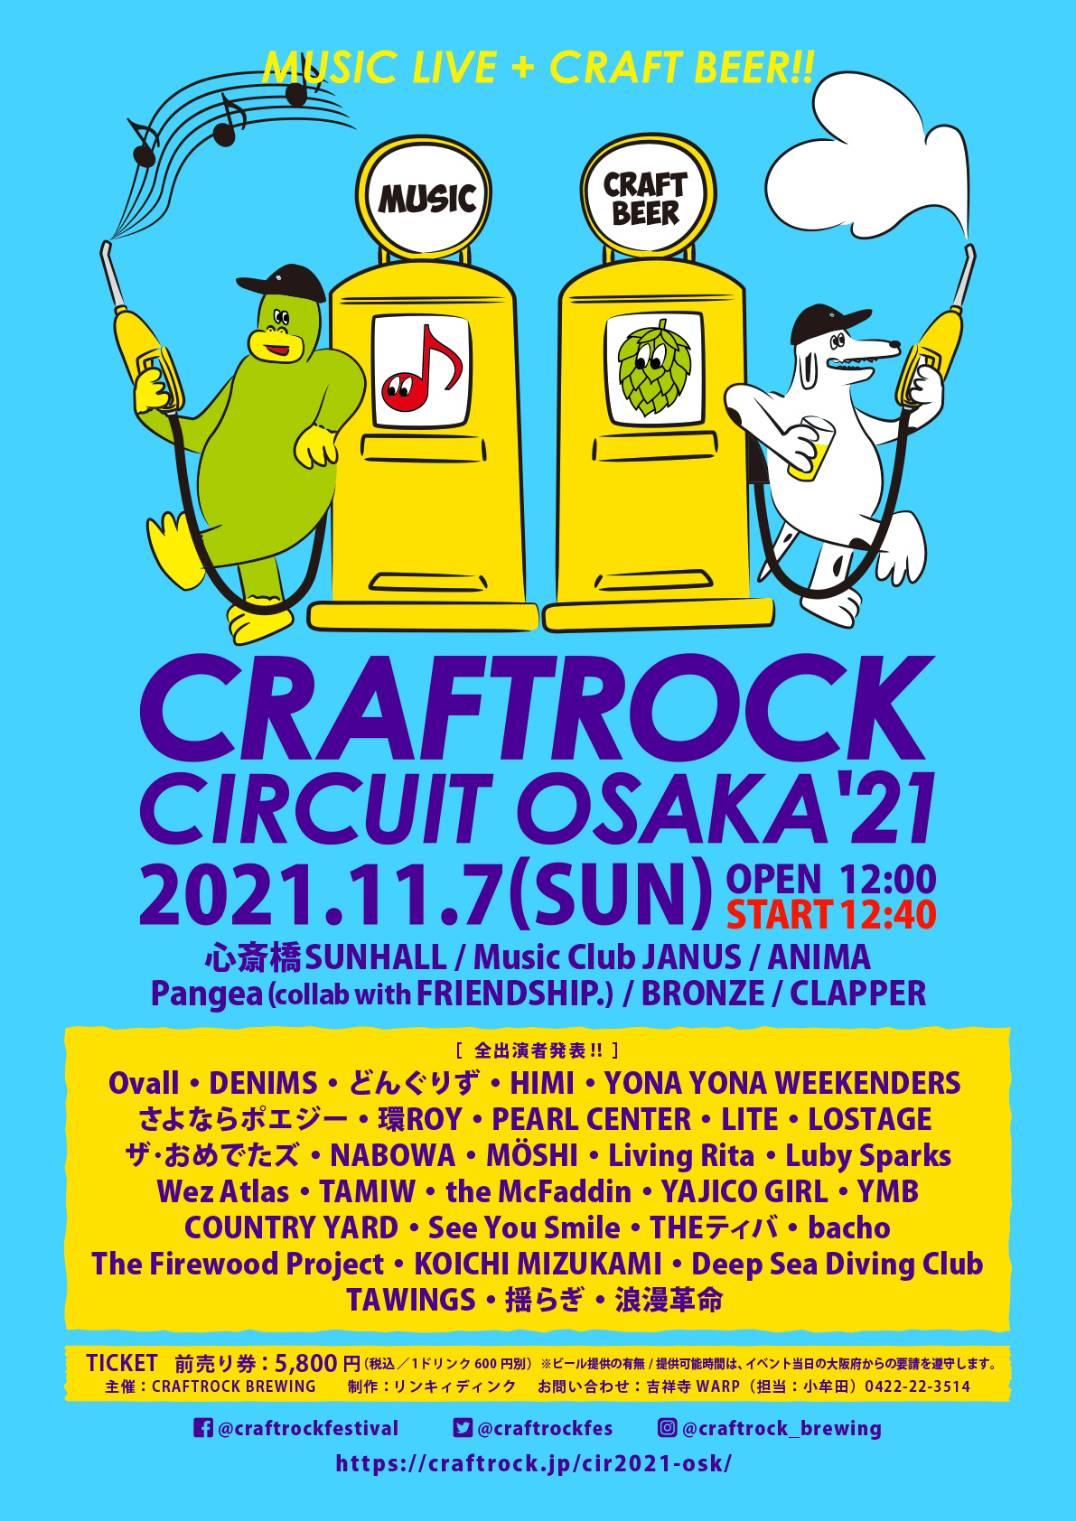 CRAFTROCKCIRCUIT OSAKA'21